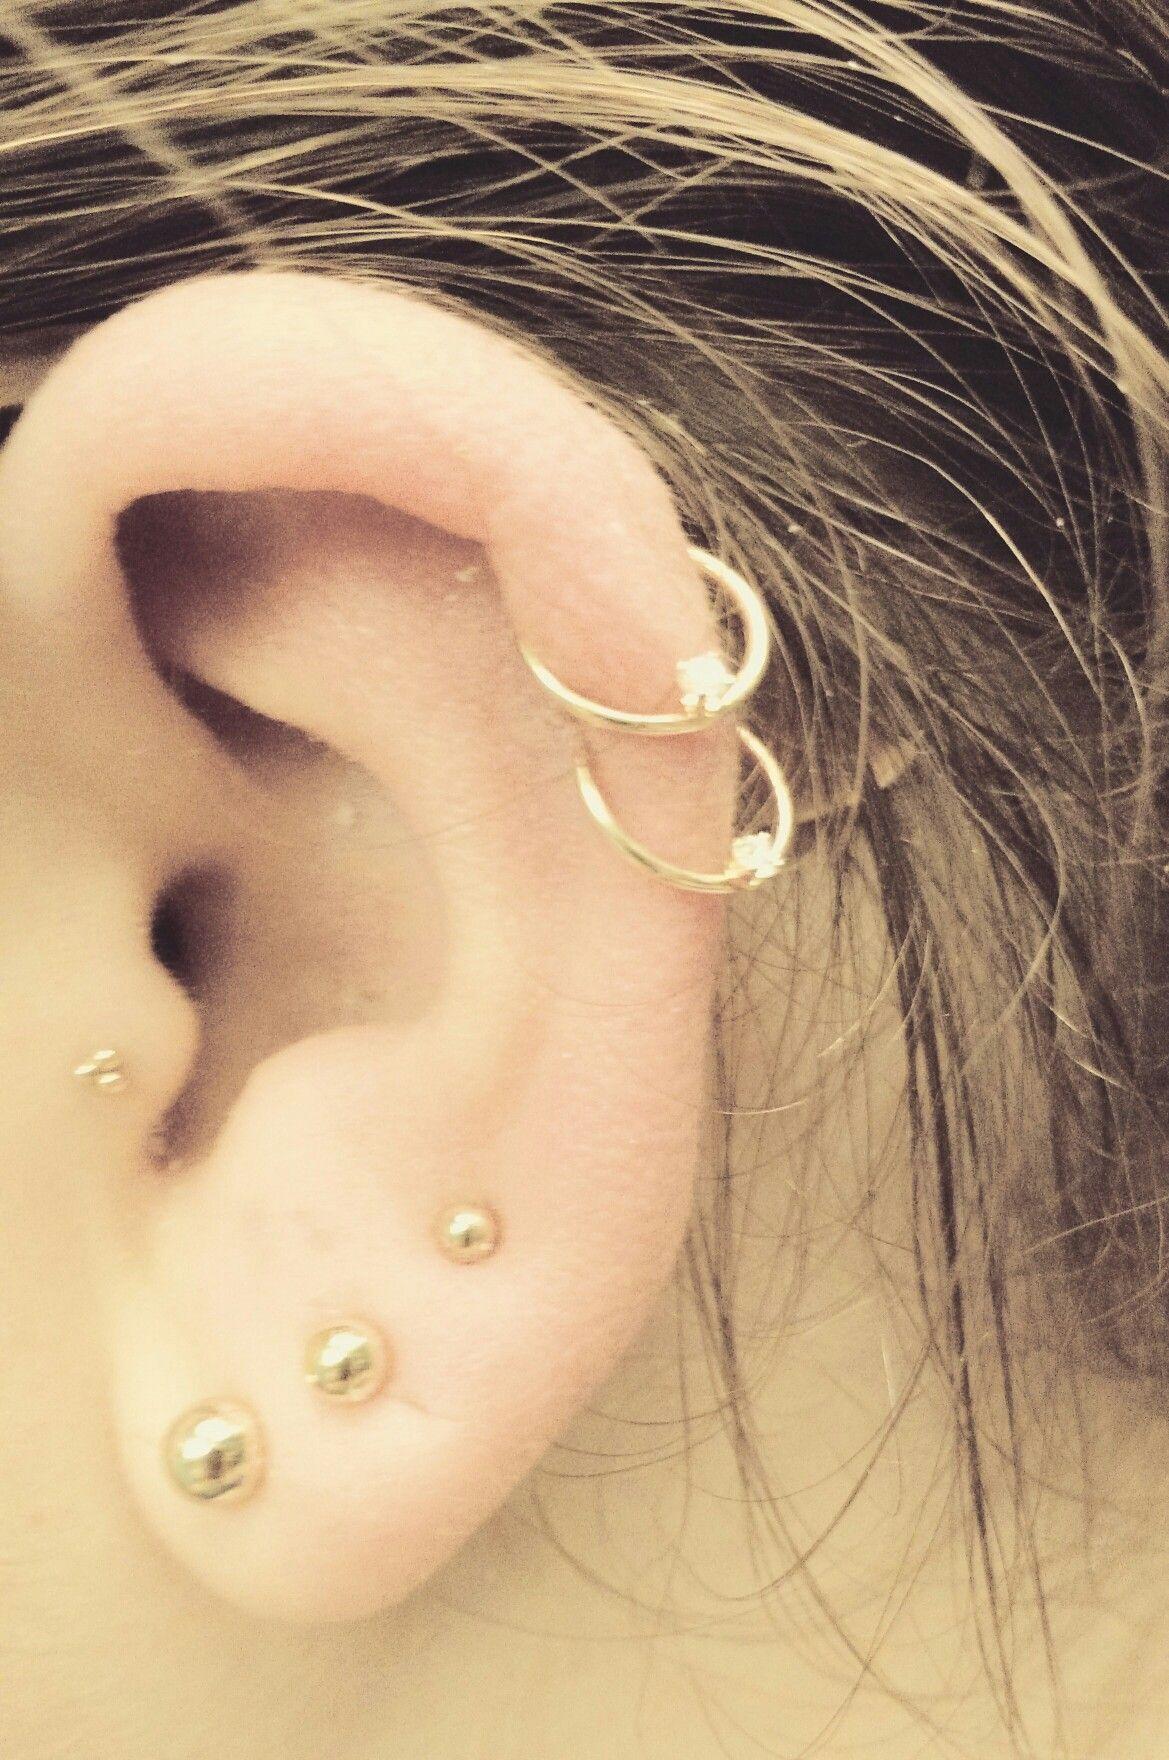 Atemberaubend double helix, tragus, 3 lobe, gold earrings, cartilage, fashion &NL_85